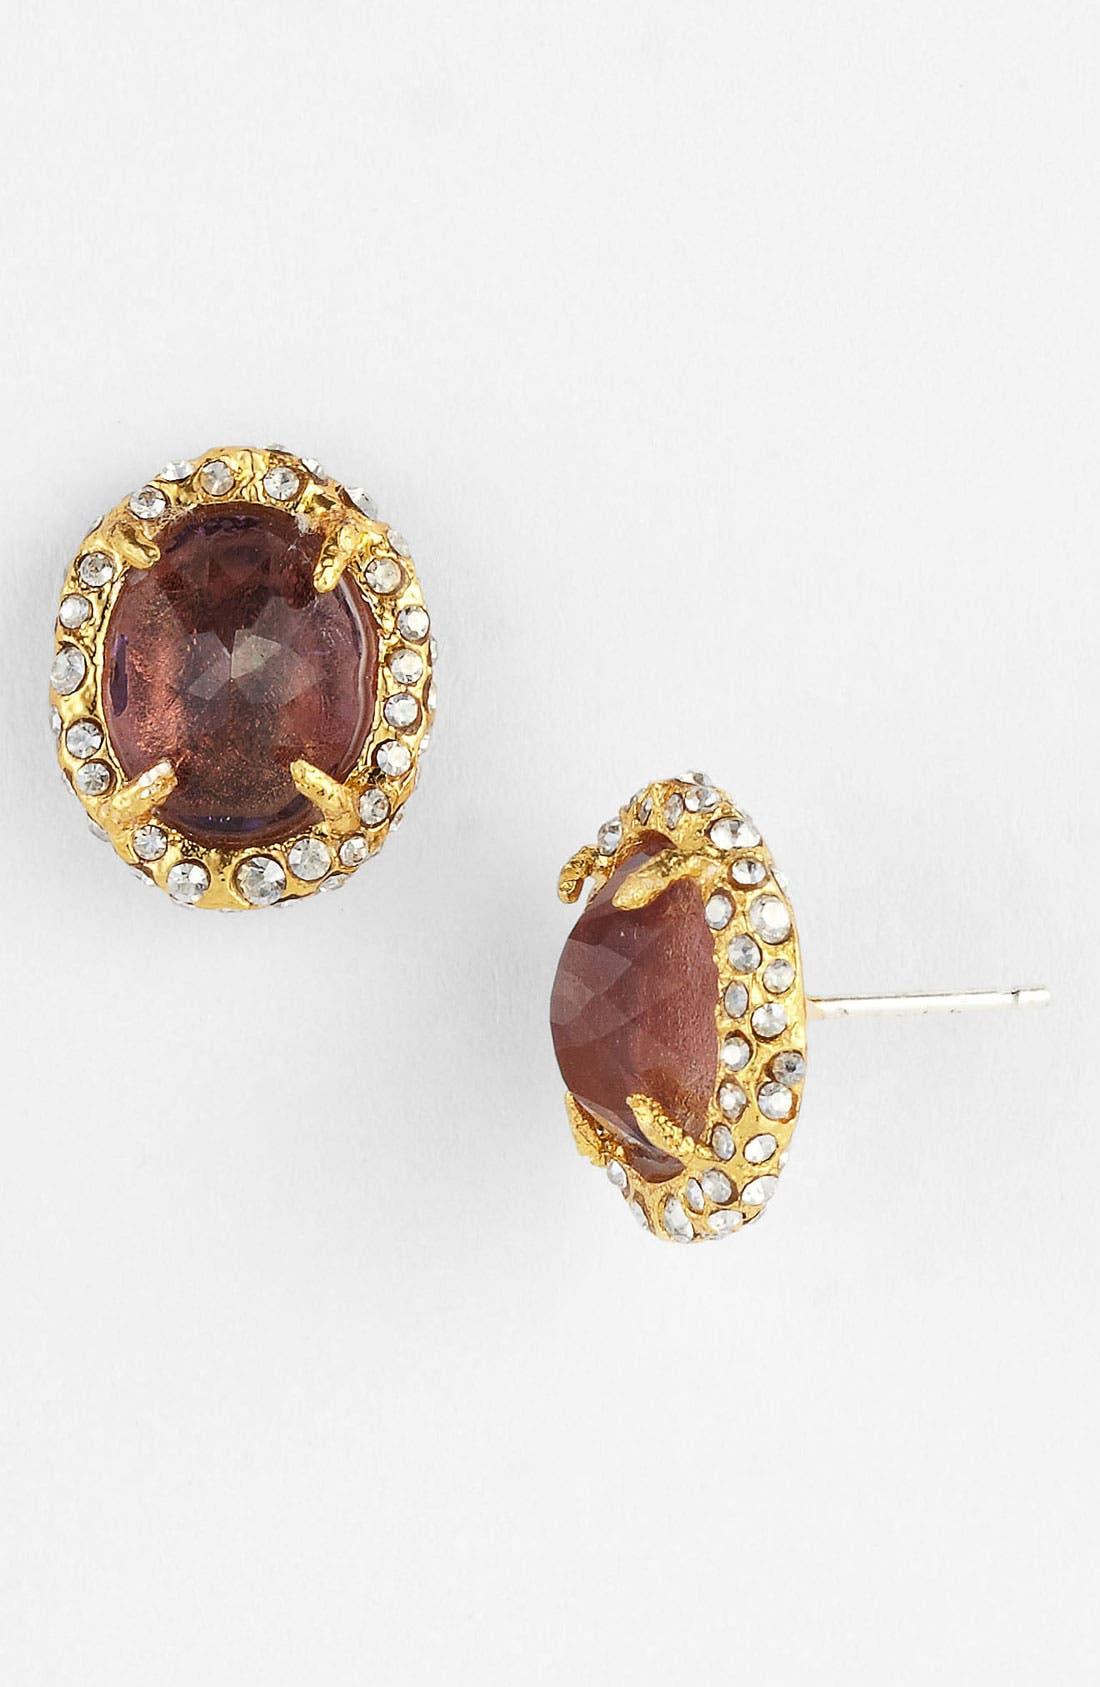 Main Image - Alexis Bittar 'Elements - Siyabona' Stone Stud Earrings (Nordstrom Exclusive)